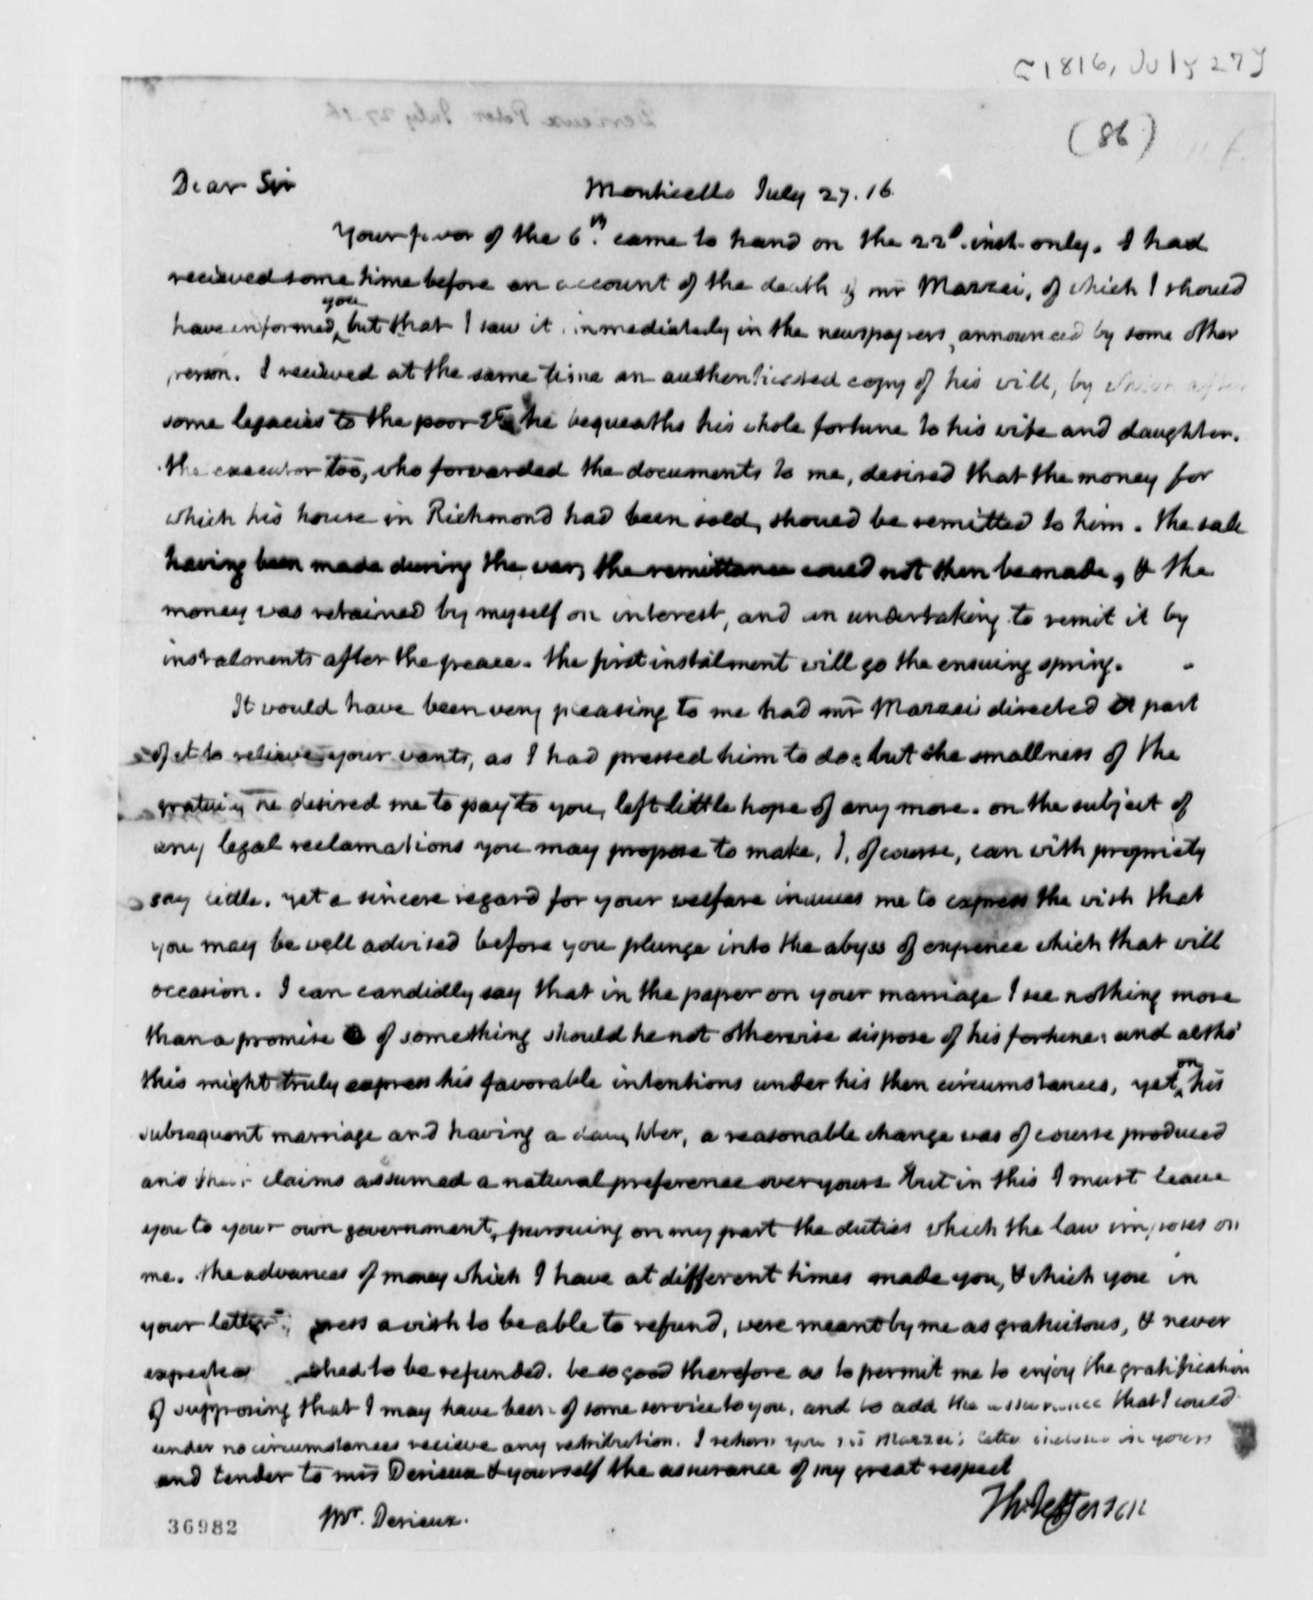 Thomas Jefferson to Justin Pierre Plumard Derieux, July 27, 1816